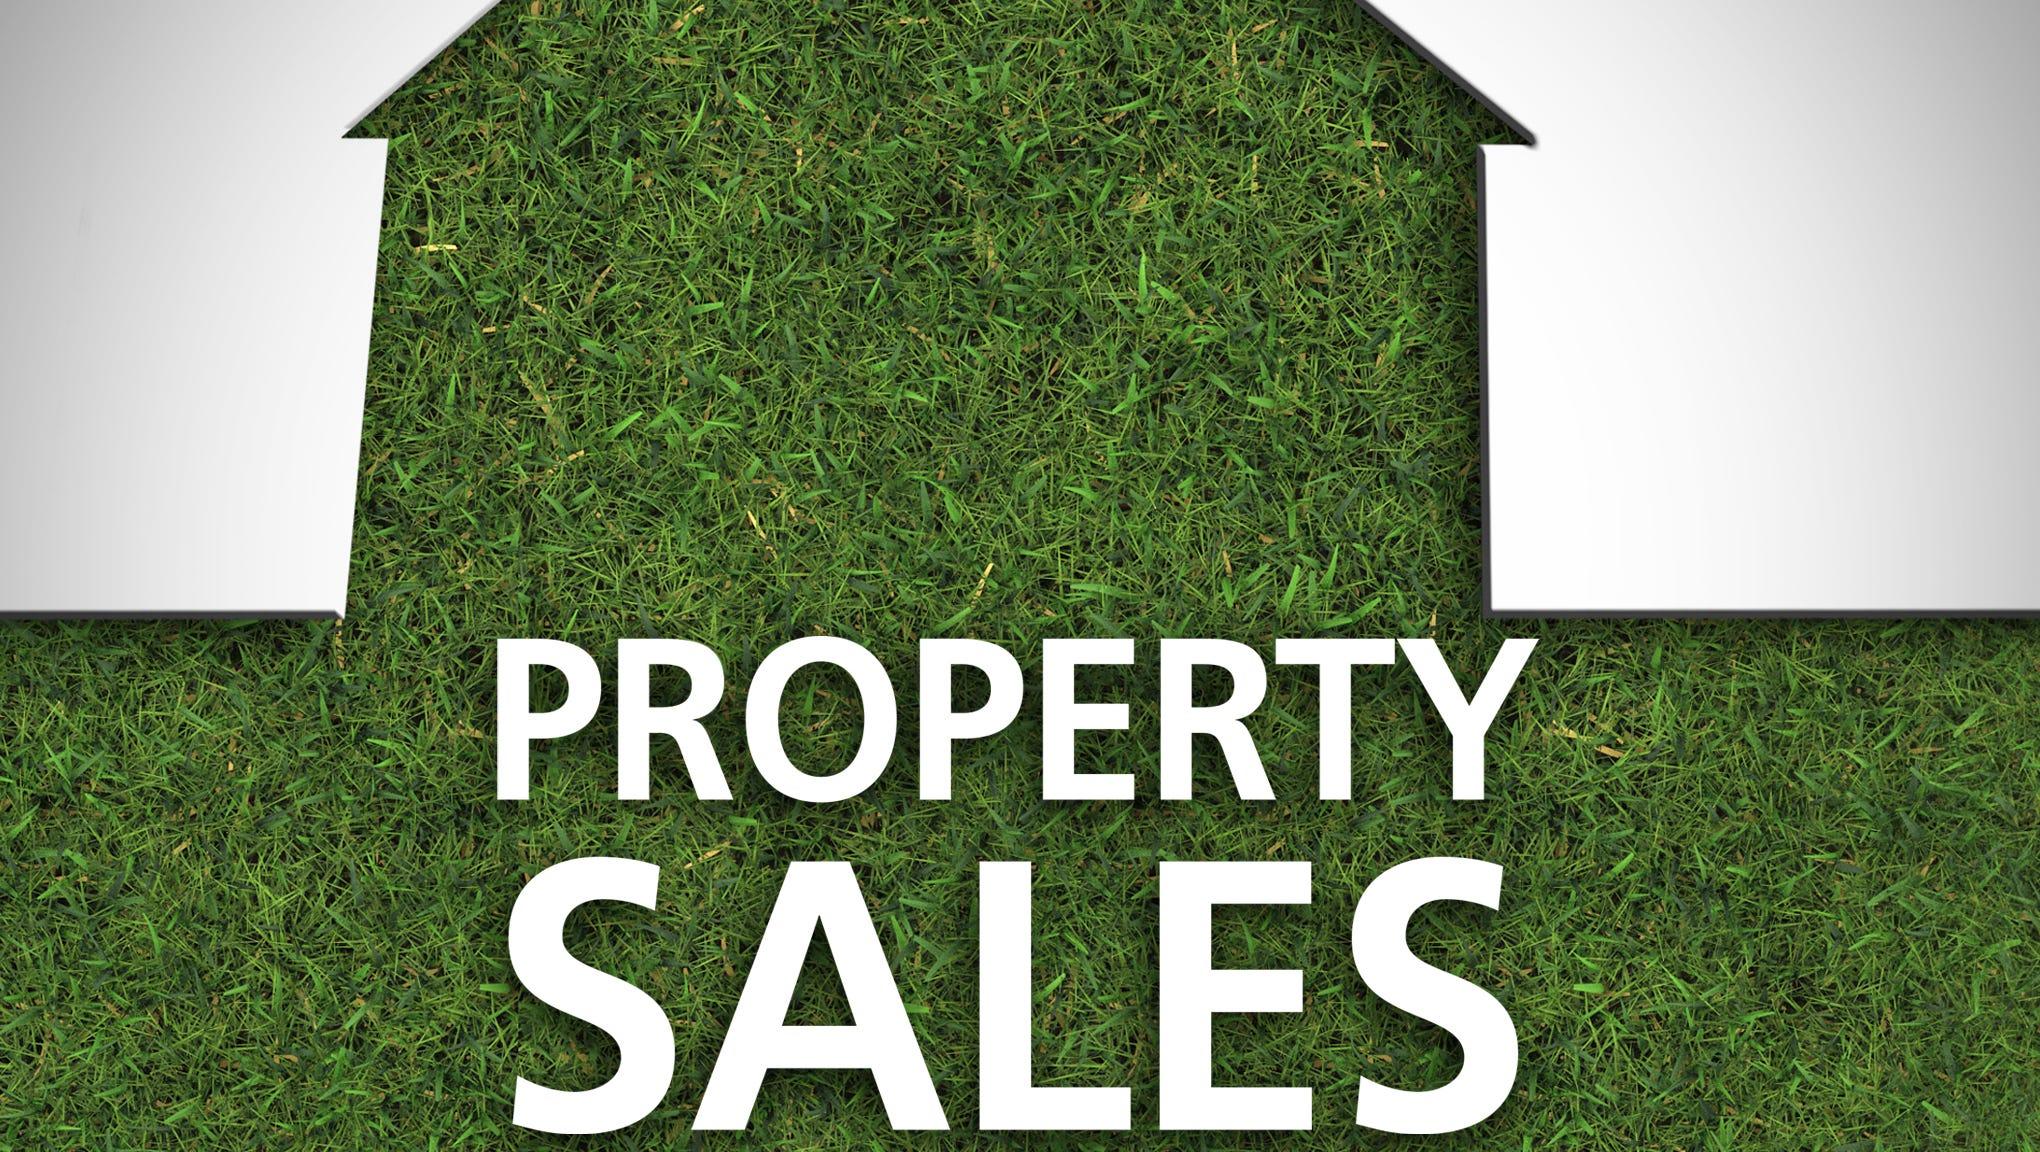 1403892576005 Presto graphic PropertySales JPG?crop=2040,1152,x0,y444&width=2040&height=1152&format=pjpg&auto=webp.